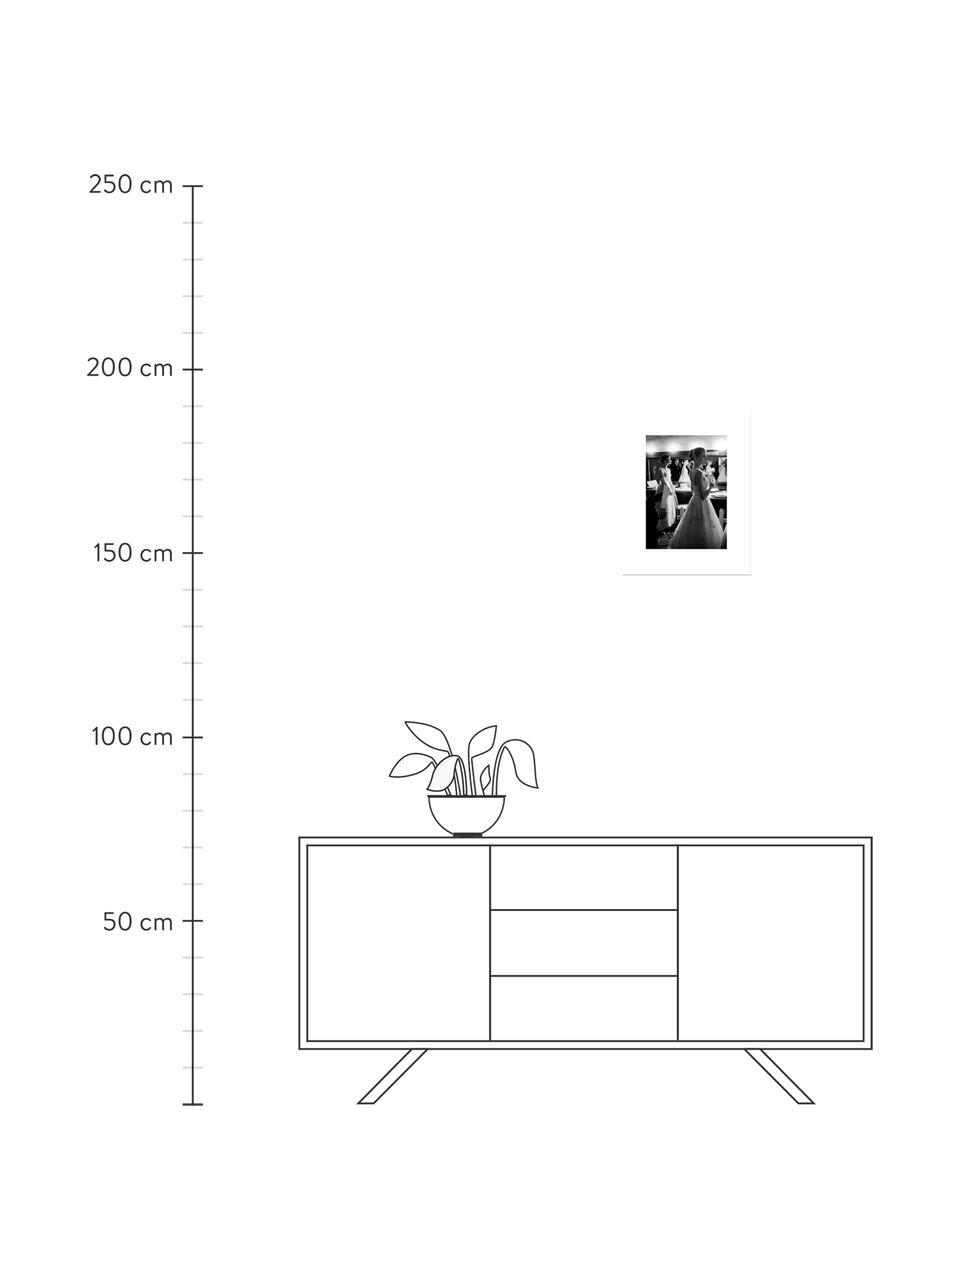 Stampa digitale incorniciata Grace Kelly & Audrey Hepburn, Immagine: stampa digitale su carta, Cornice: materiale sintetico (PU), Retro: pannelli di fibre a media, Immagine: nero, bianco cornice: nero, Larg. 35 x Alt. 45 cm